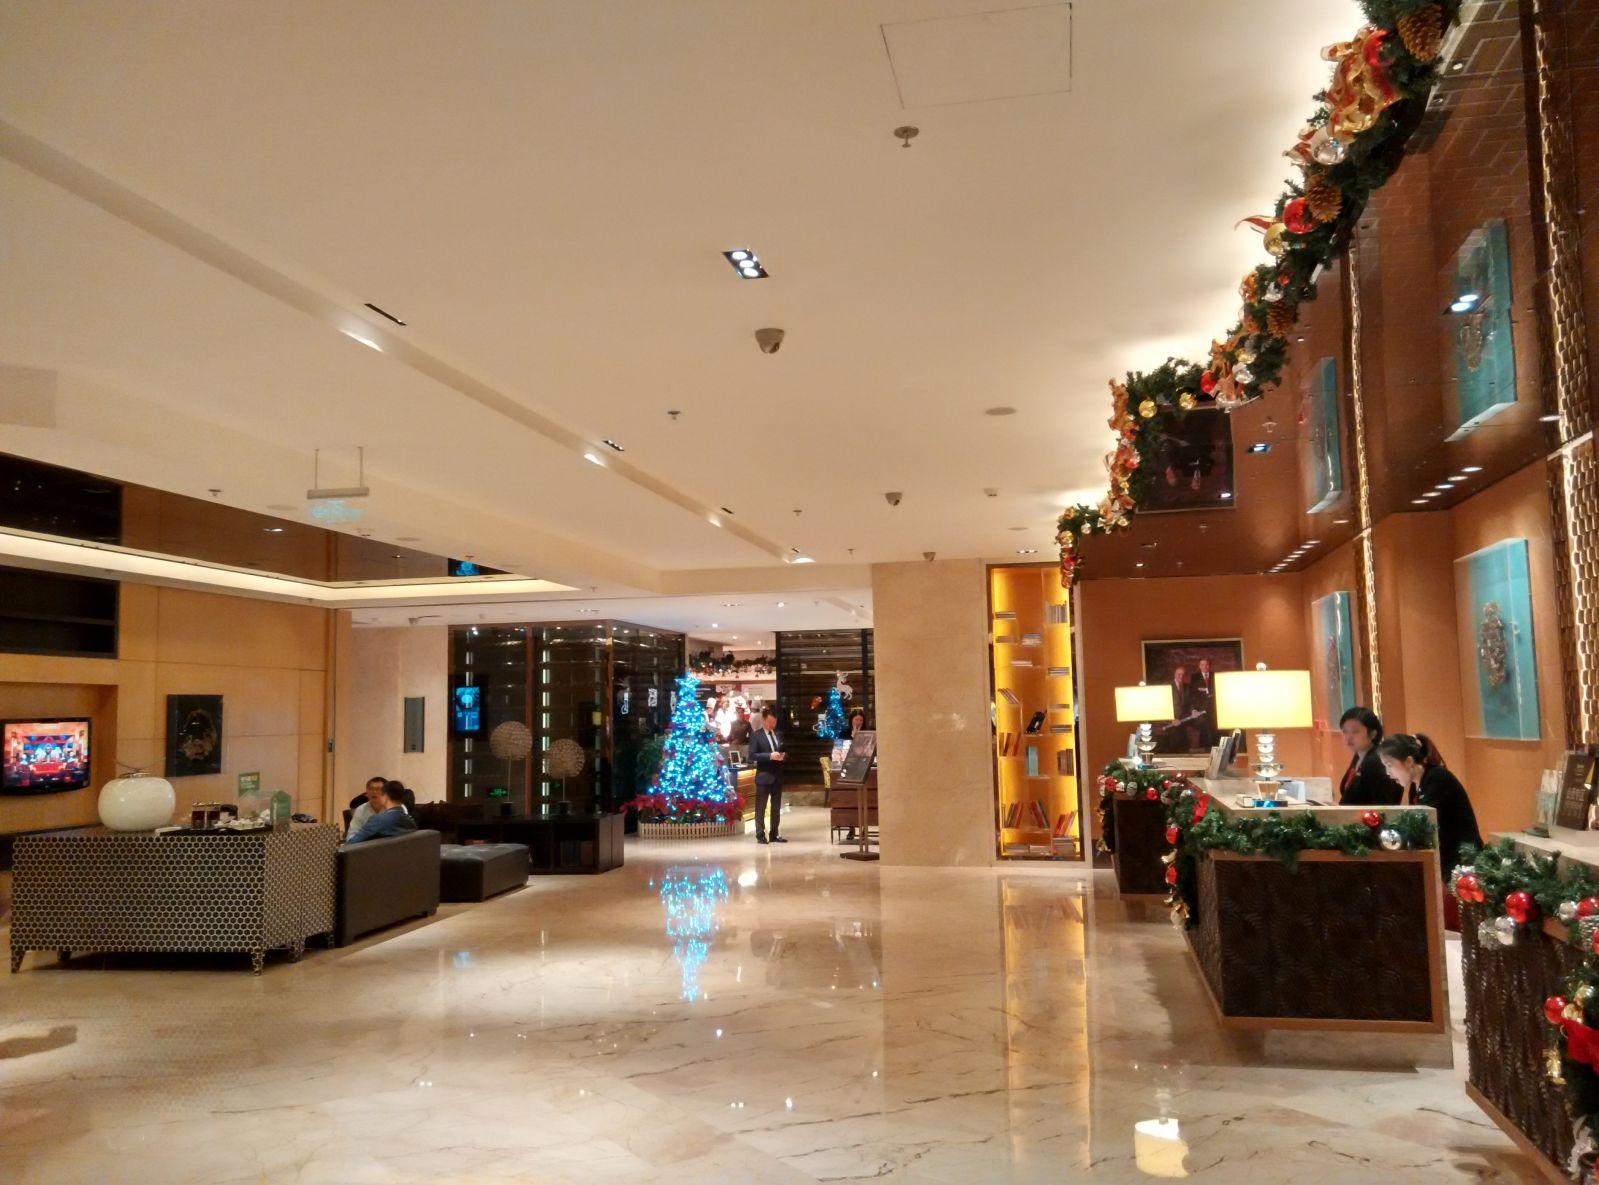 guangzhou-marriott-tianhe-lobby